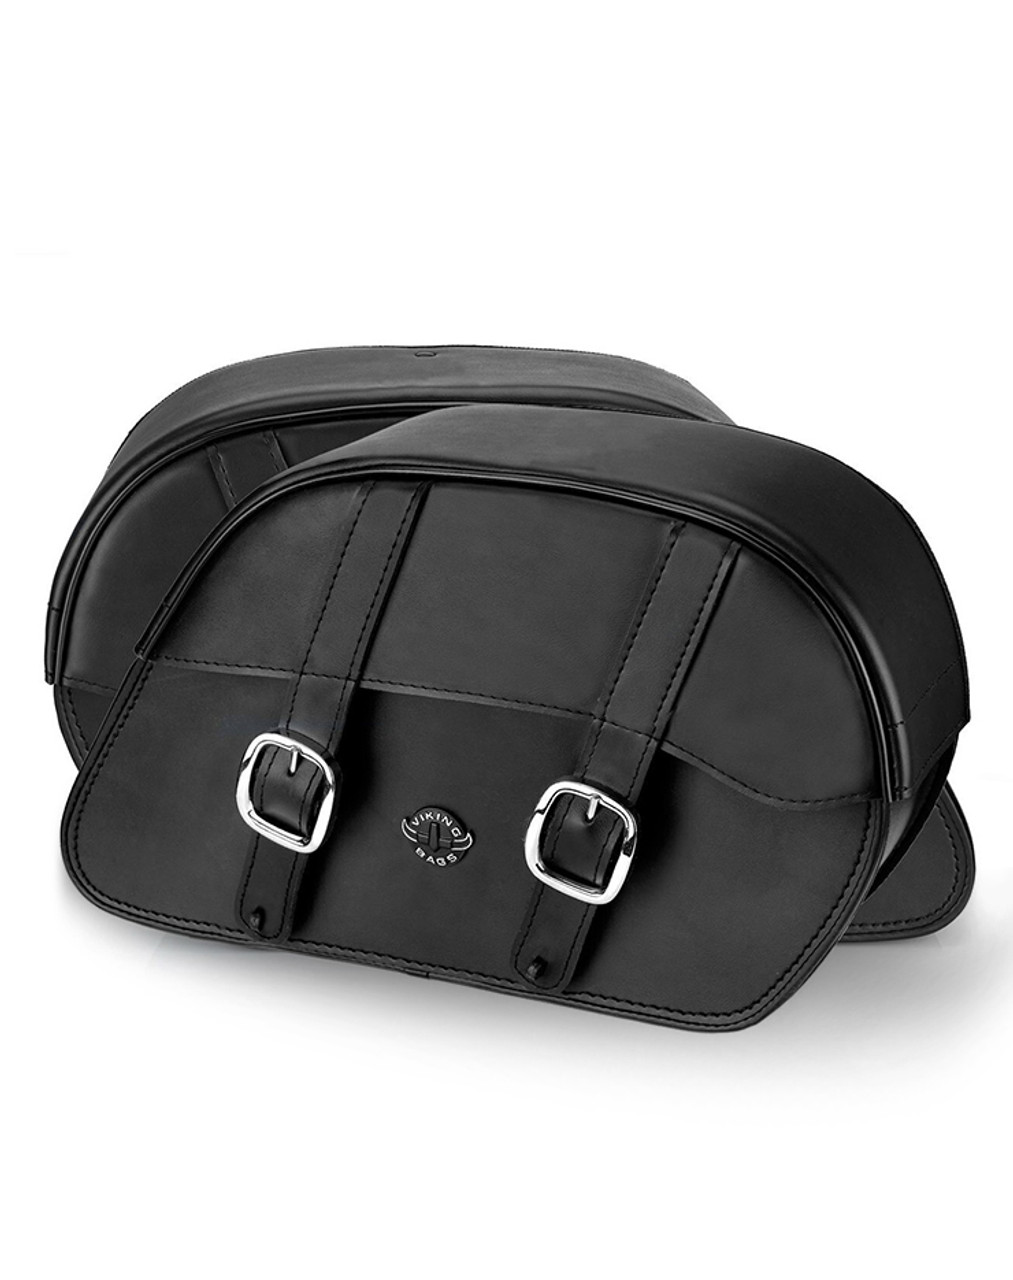 Yamaha V Star 650 Custom Slanted Medium Motorcycle Saddlebags Both Bags View